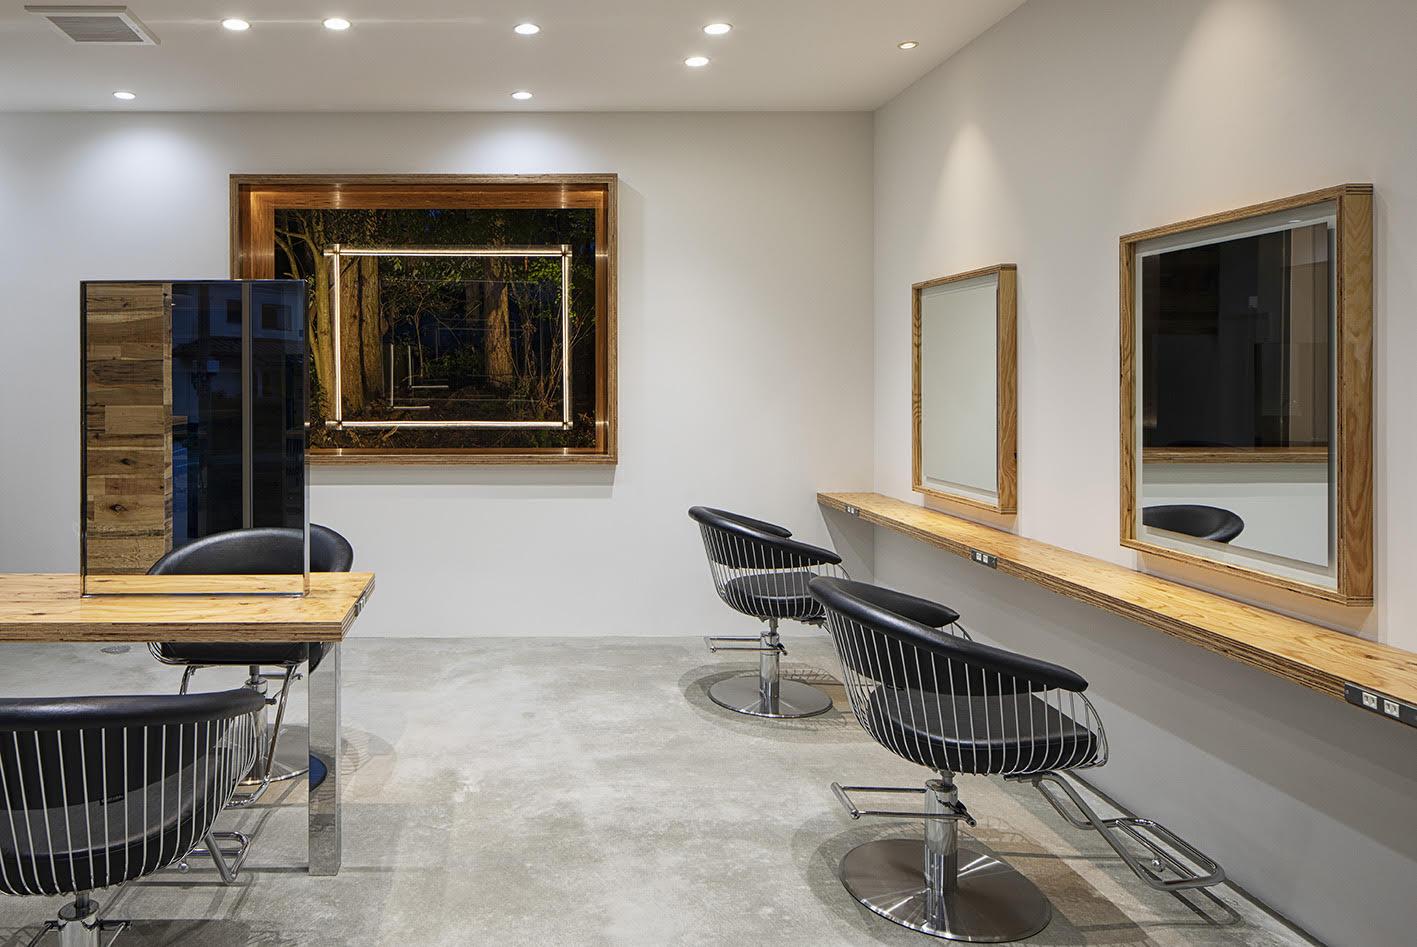 Takara Belmont salon design